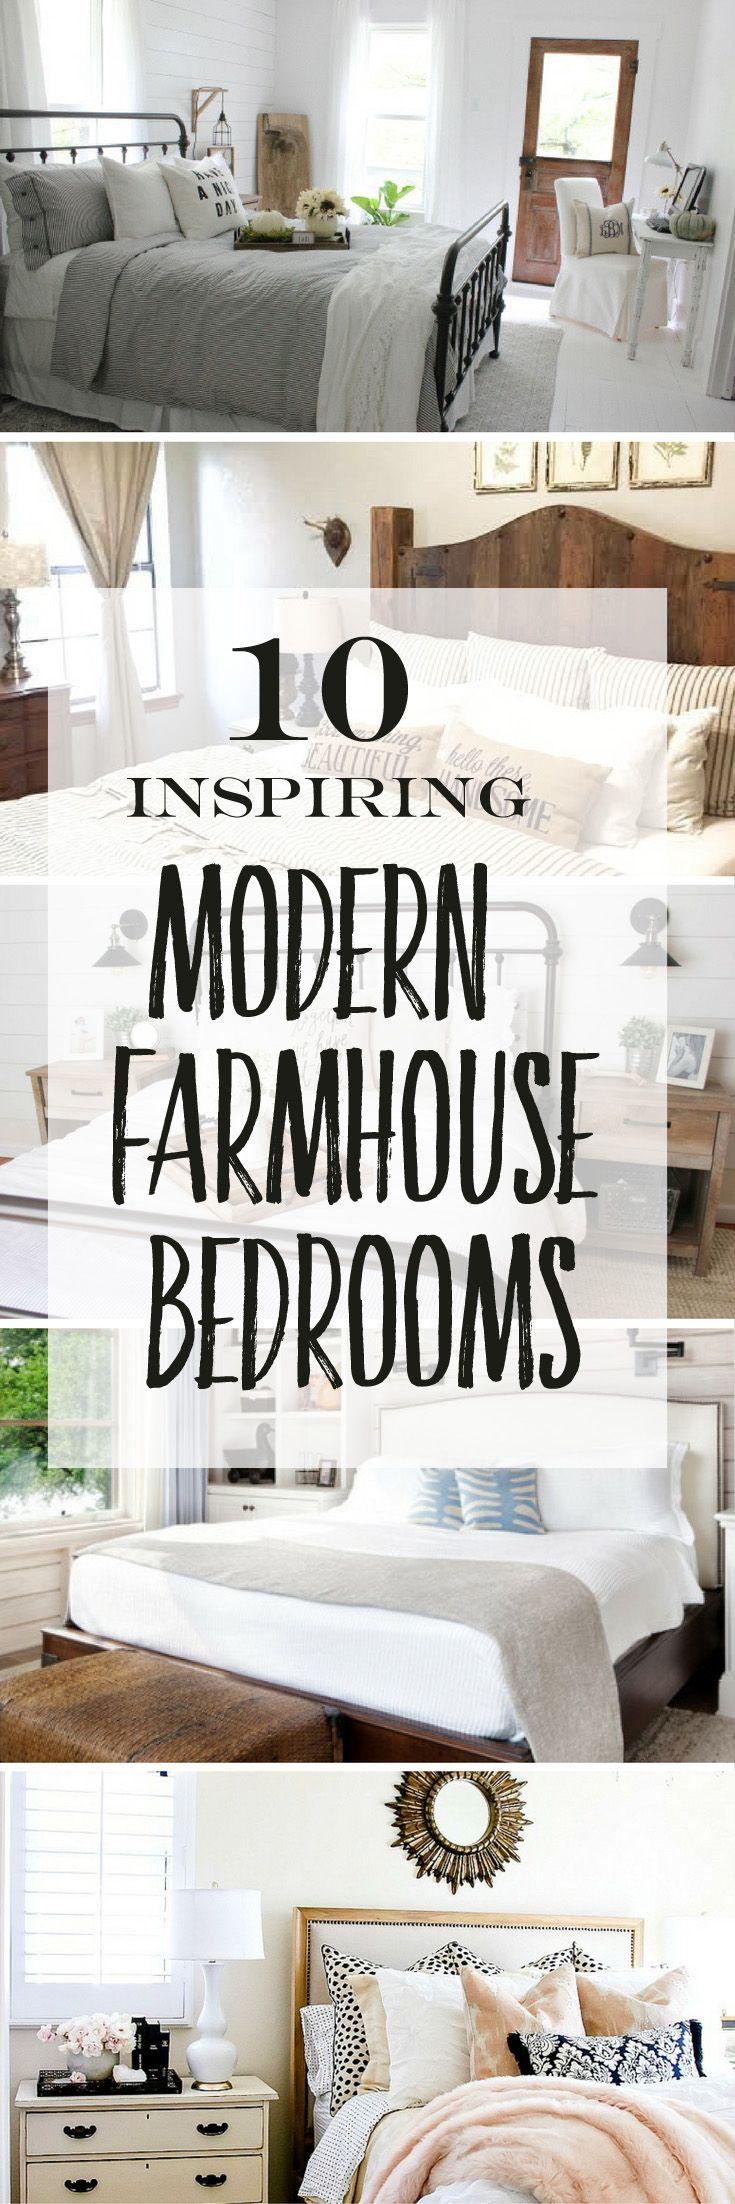 Best 25  Farmhouse bedroom decor ideas on Pinterest Modern Farmhouse Bedrooms. Farmhouse Bedrooms. Home Design Ideas